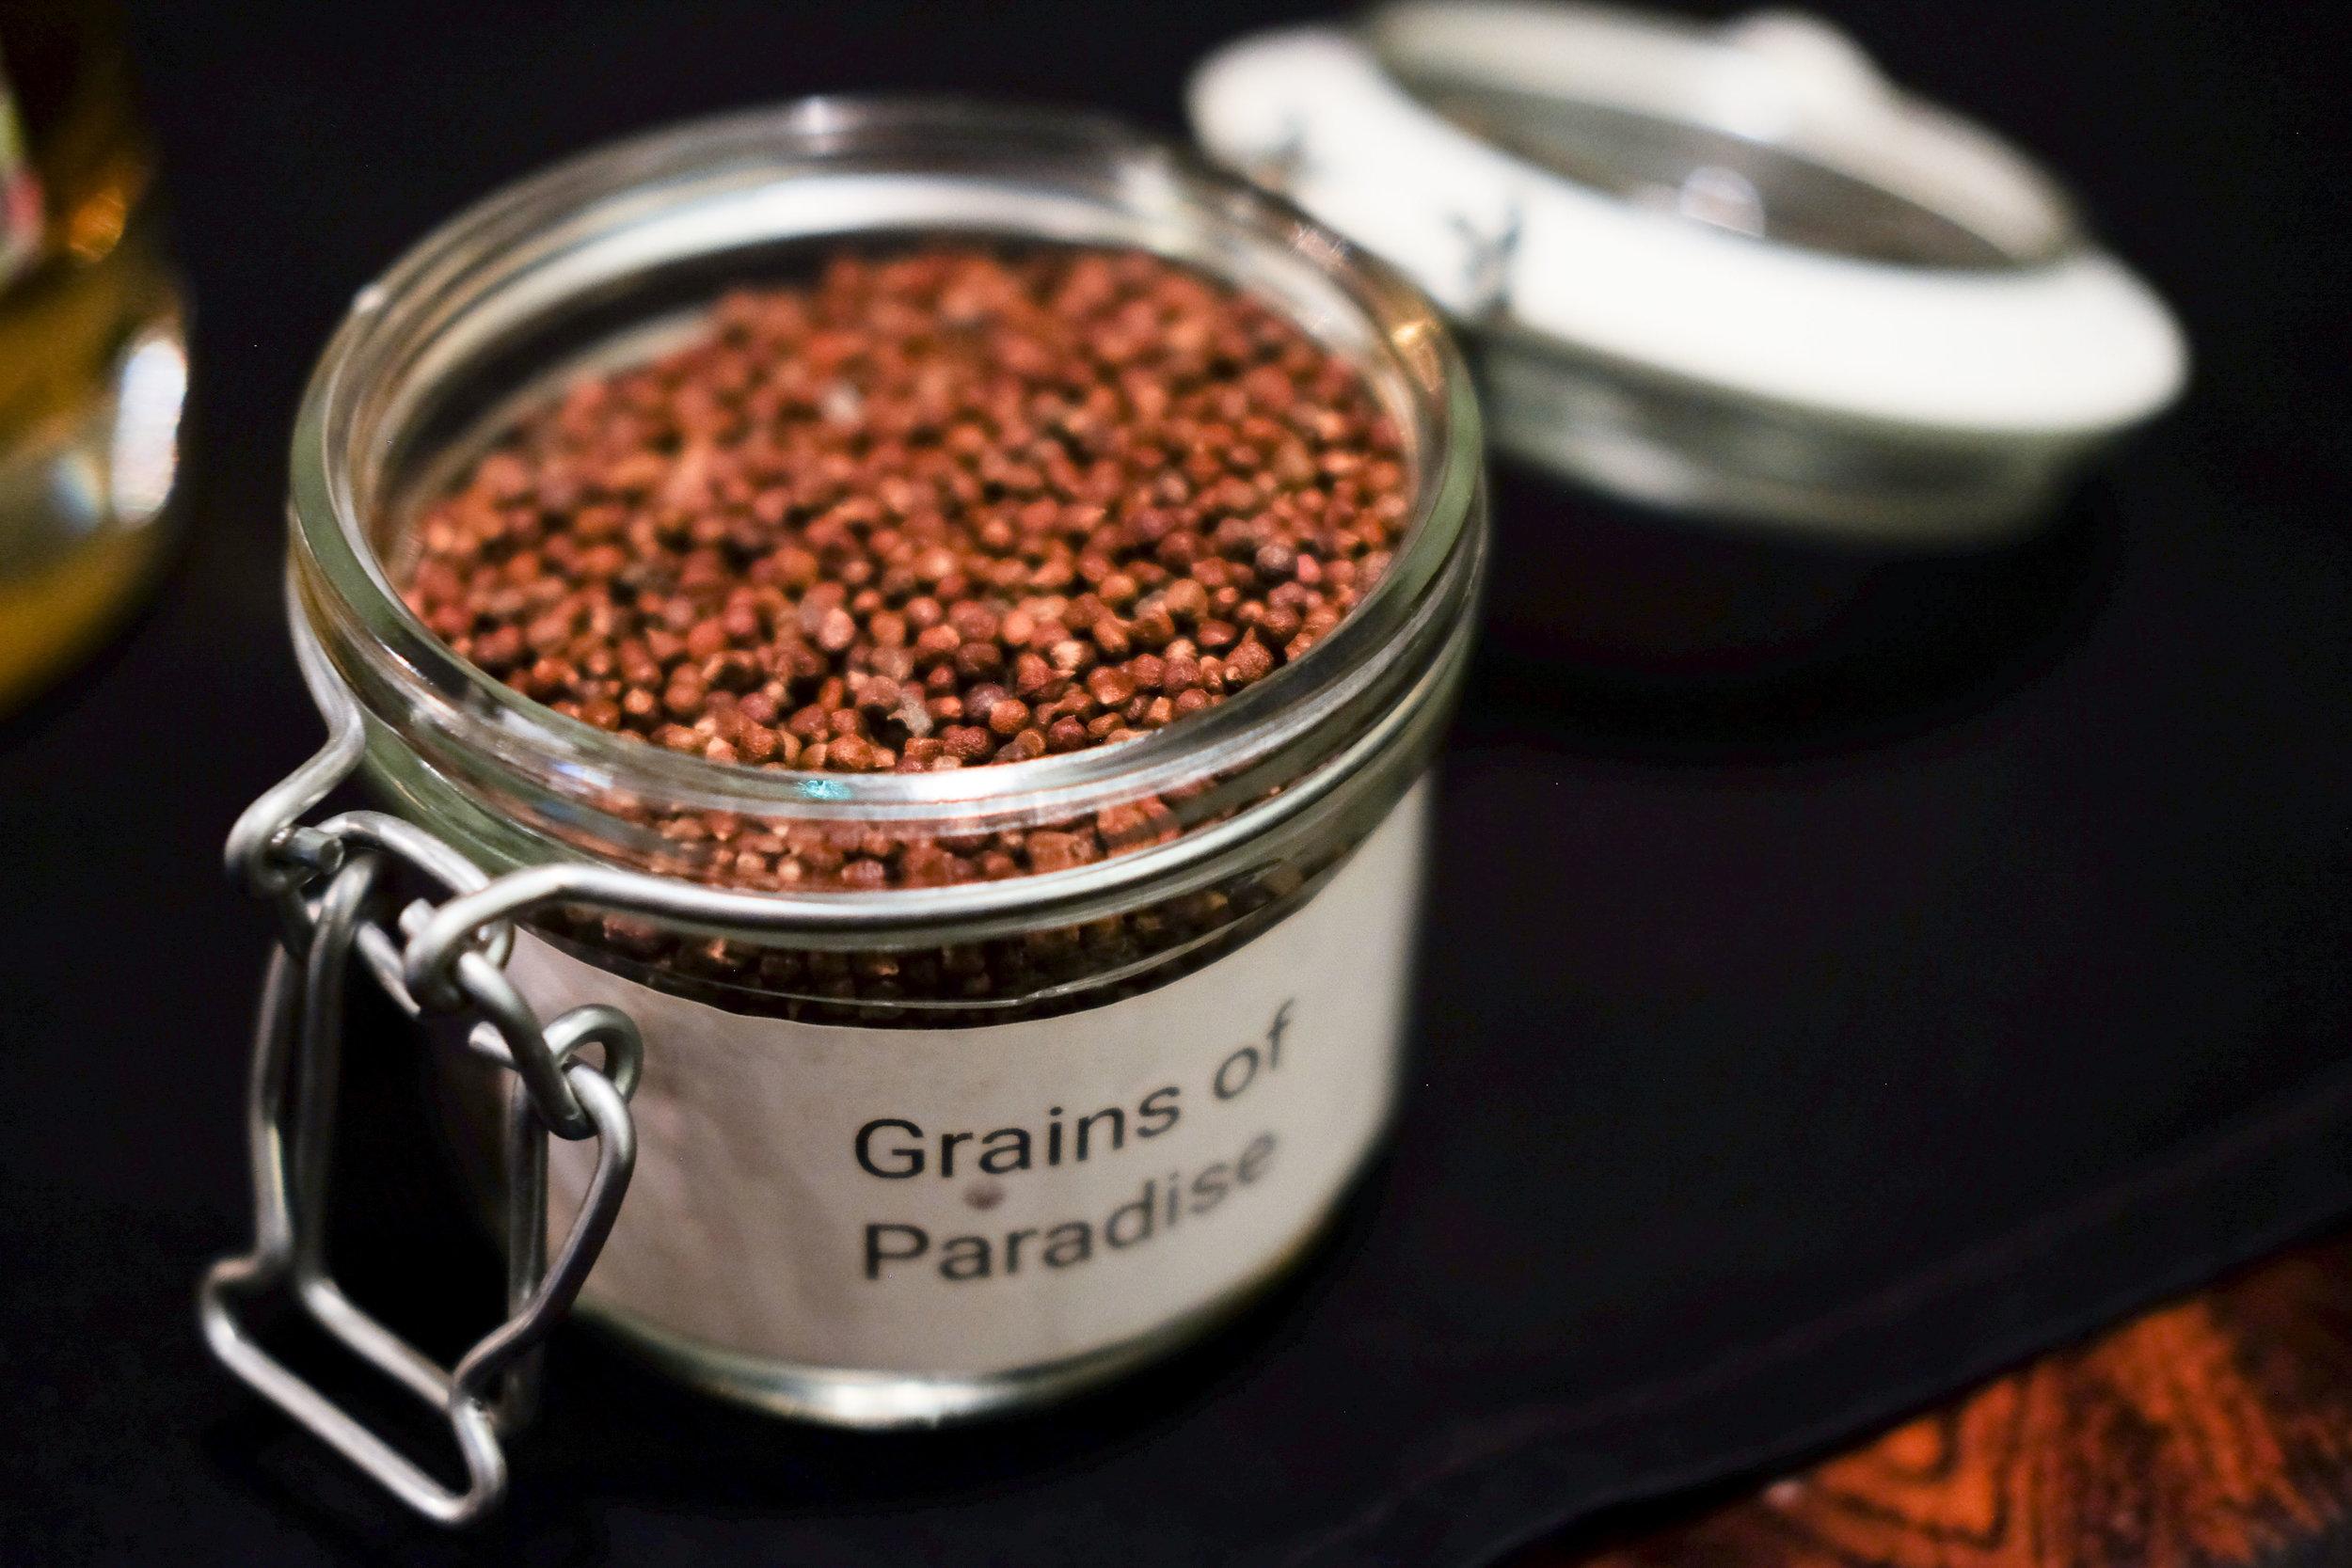 bristol_dry_gin_grains